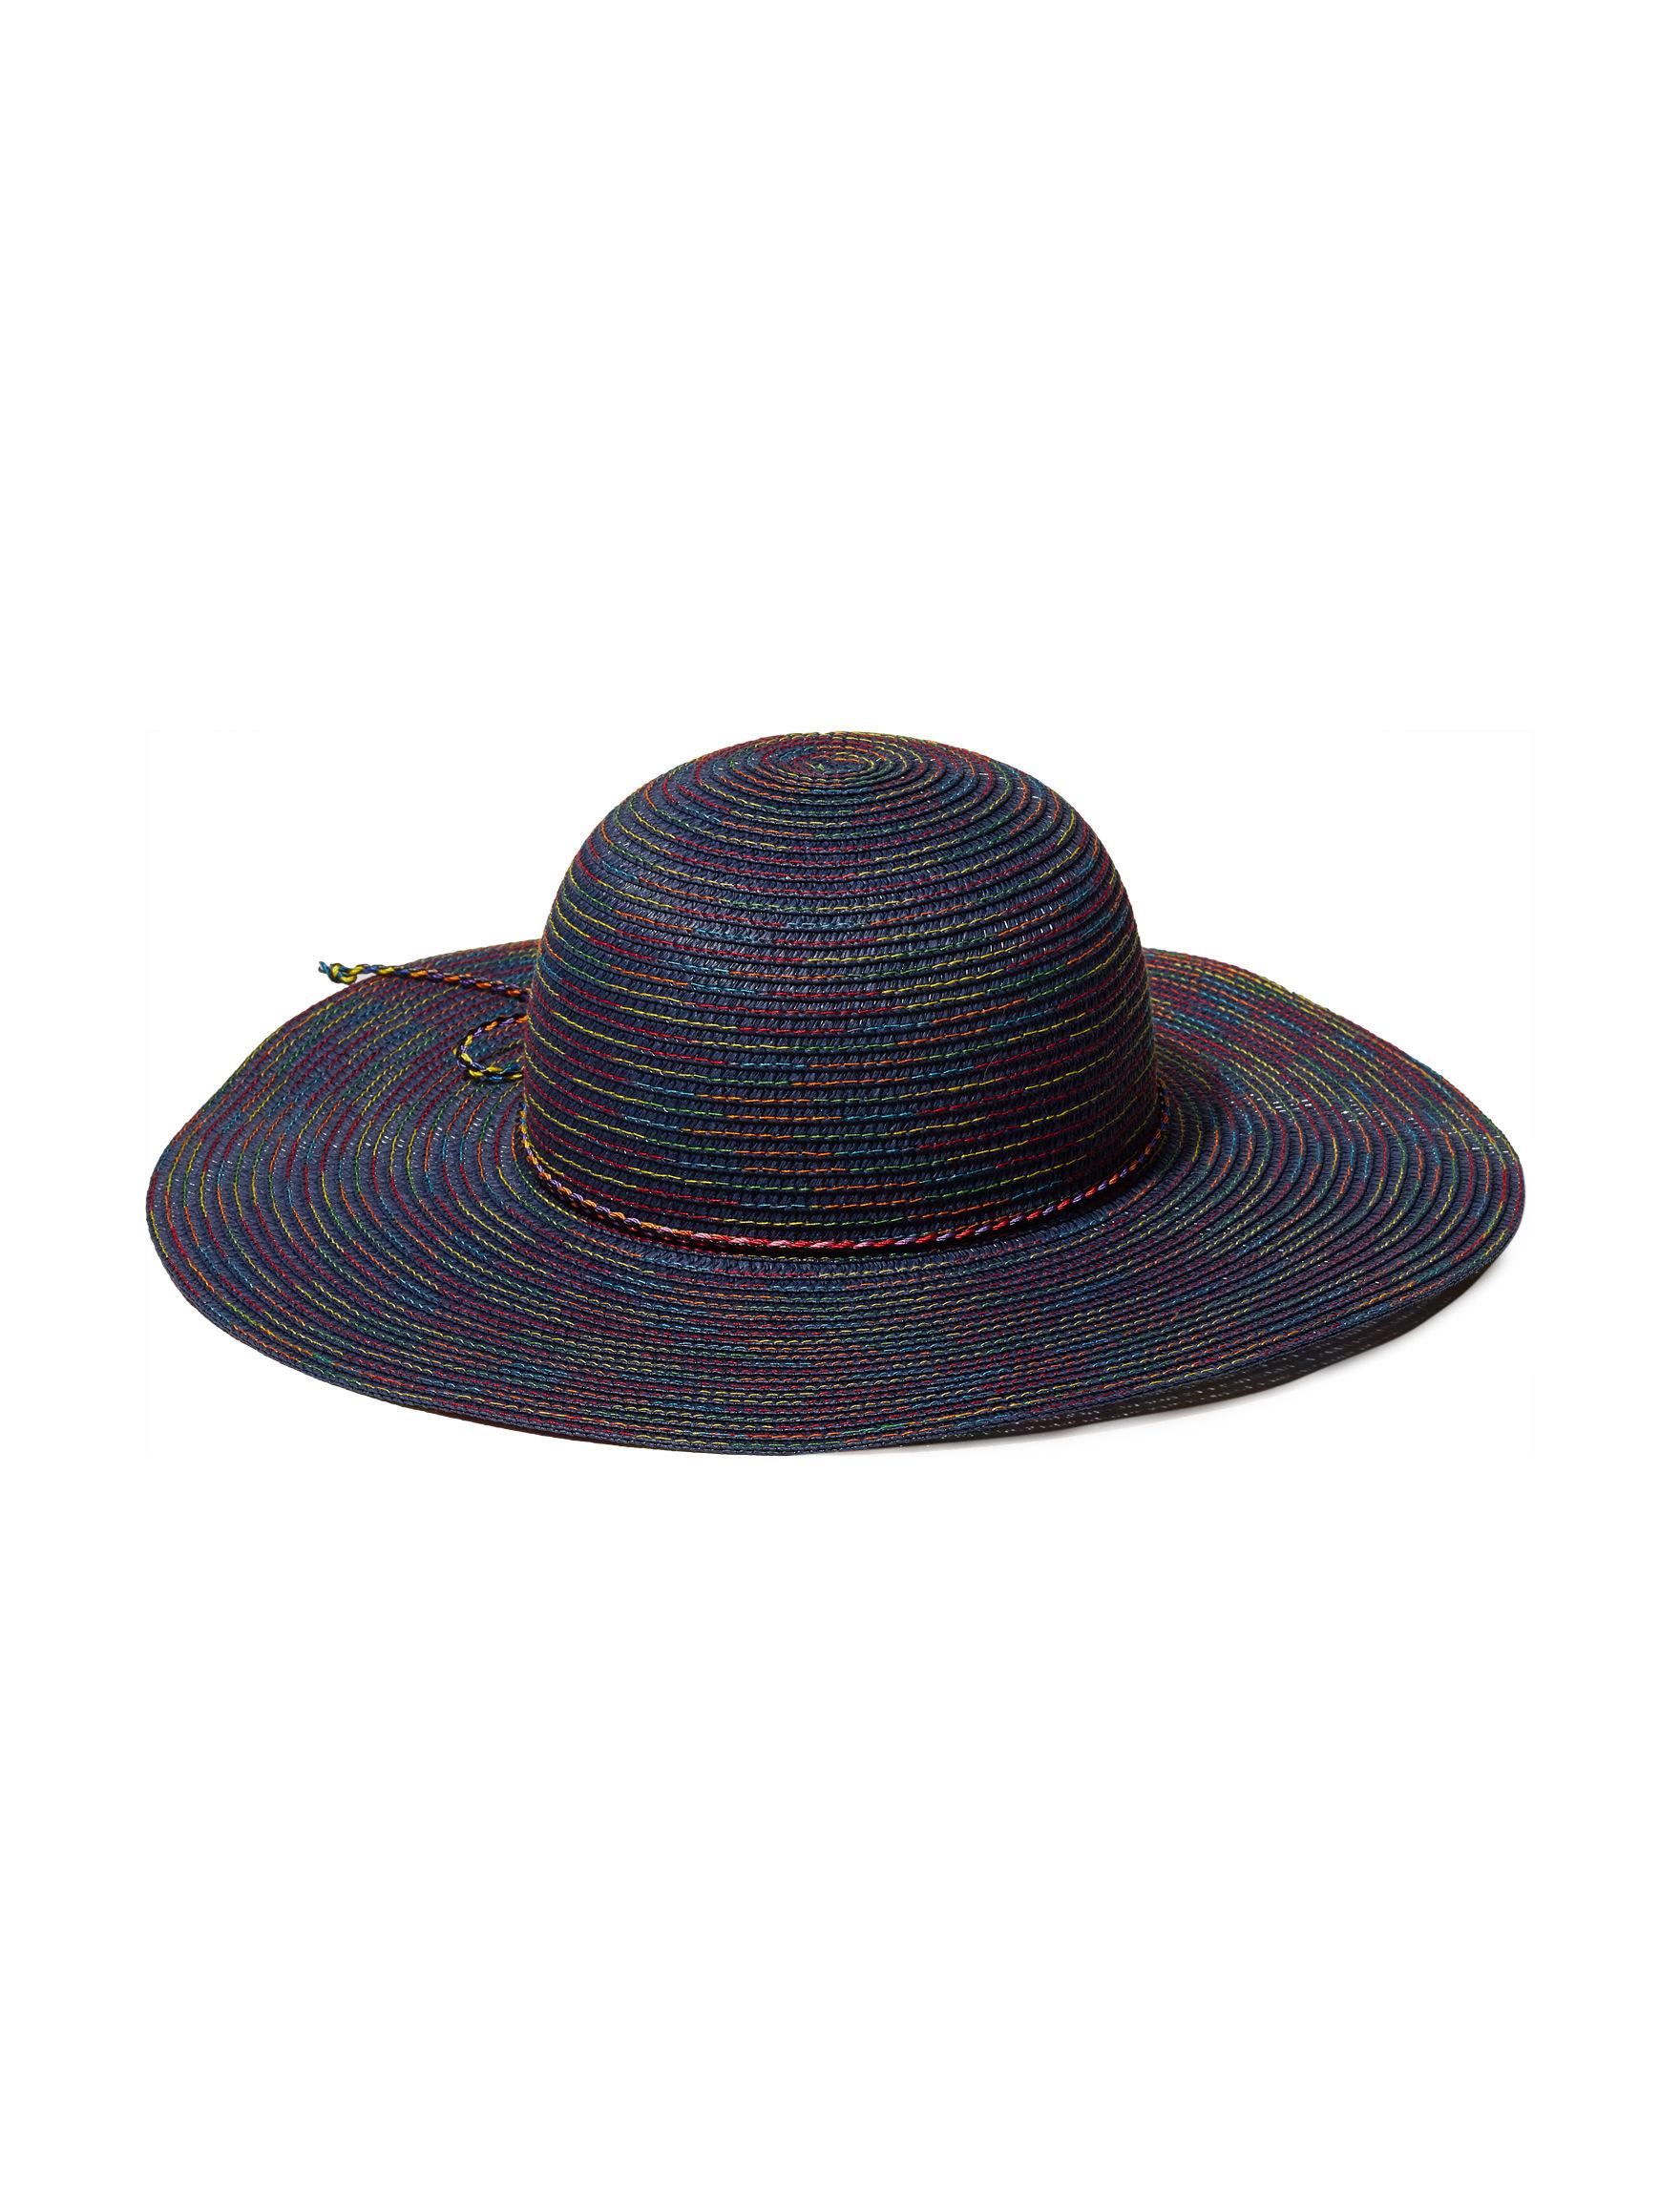 Amiee Lynn Navy Hats & Headwear